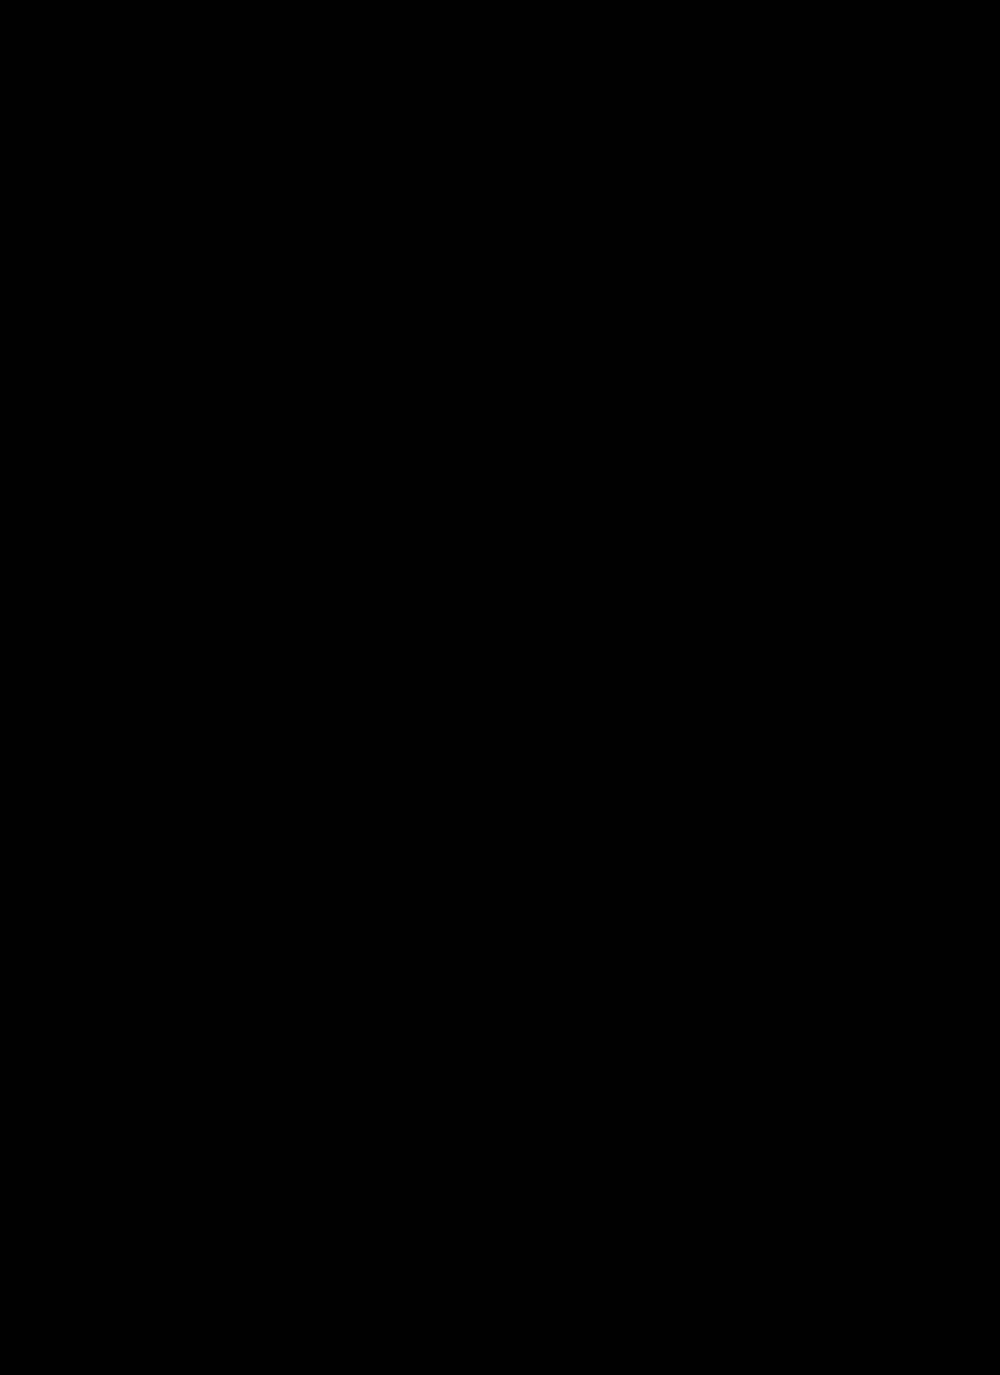 lic-004